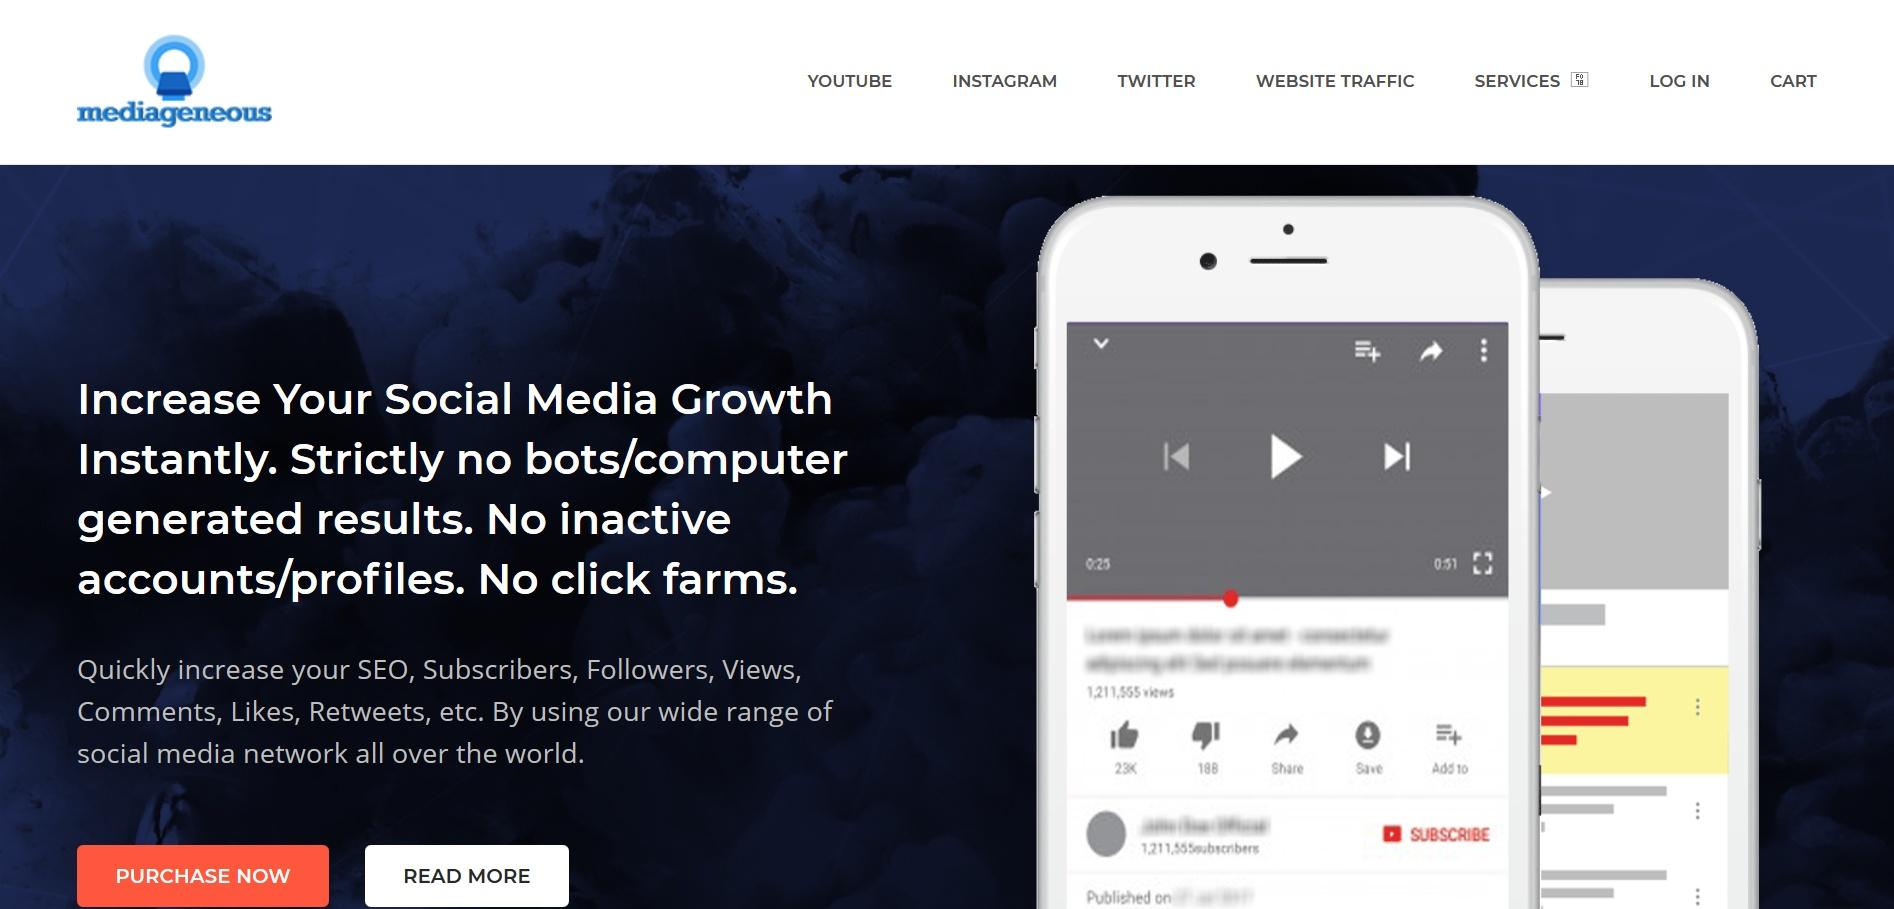 Buy advertising for youtube,twitter,website,instagram,facebook, pinterest and more Media Geneous